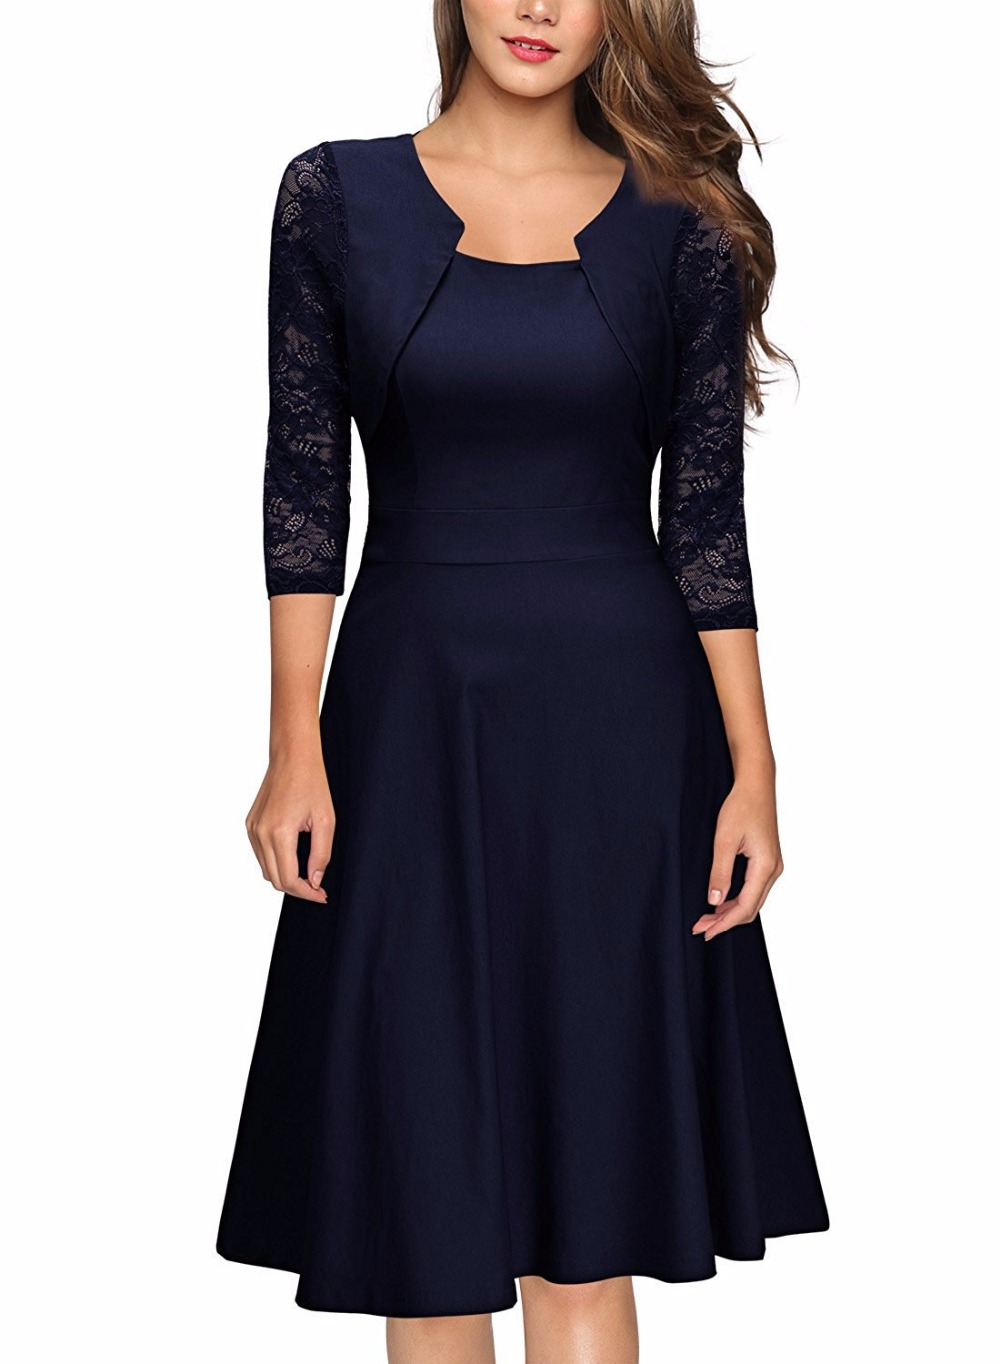 Elegant Designer Lace A Line Dress Women 2017 Knit Runway Green ...